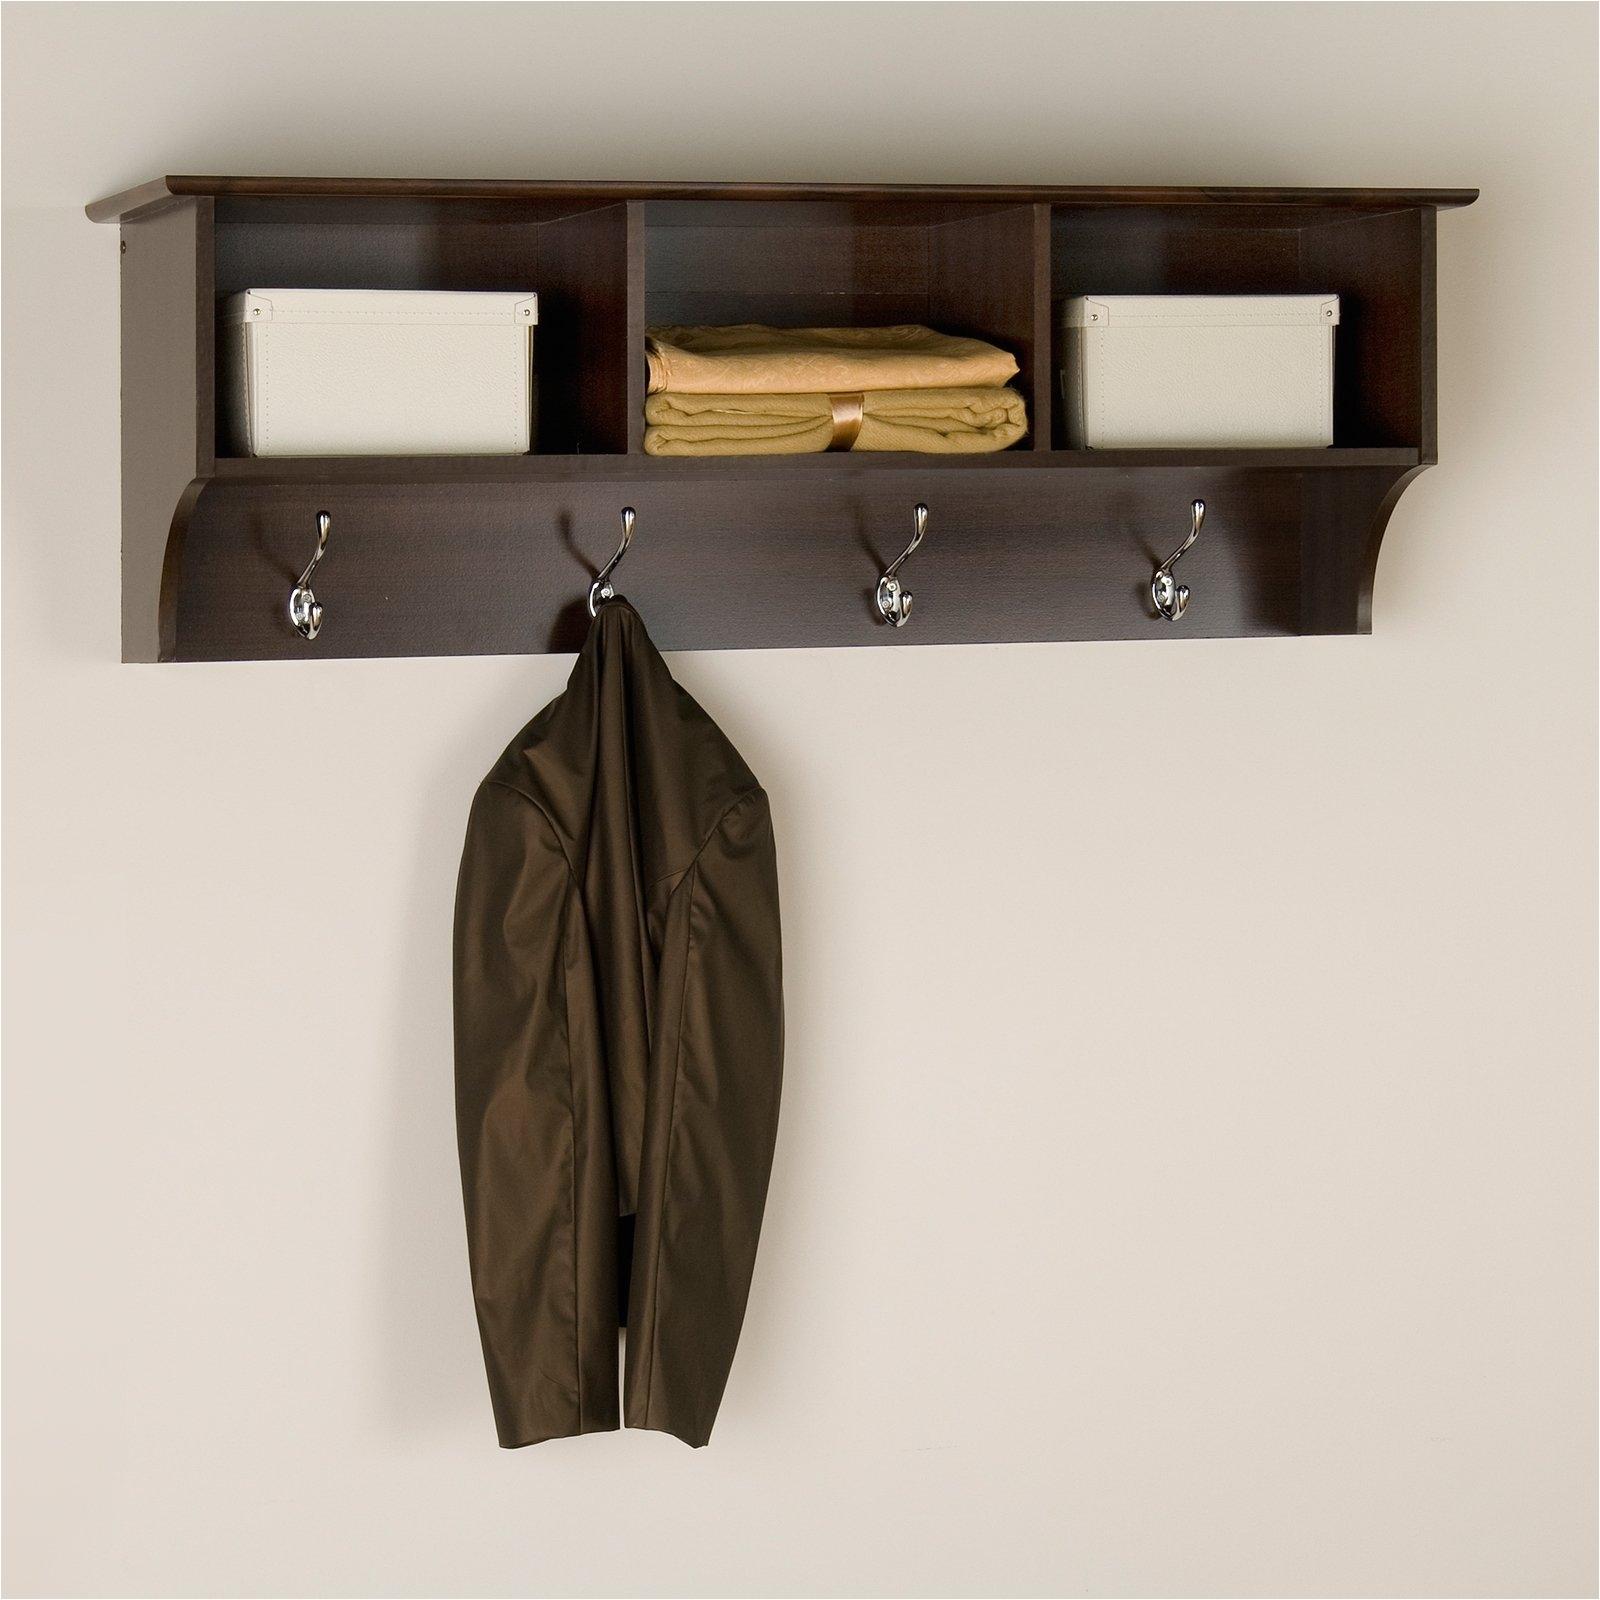 Decorative Wall Mounted Coat Rack with Hooks Coat Hooks Wall Mounted Ikea Euffslemani Com